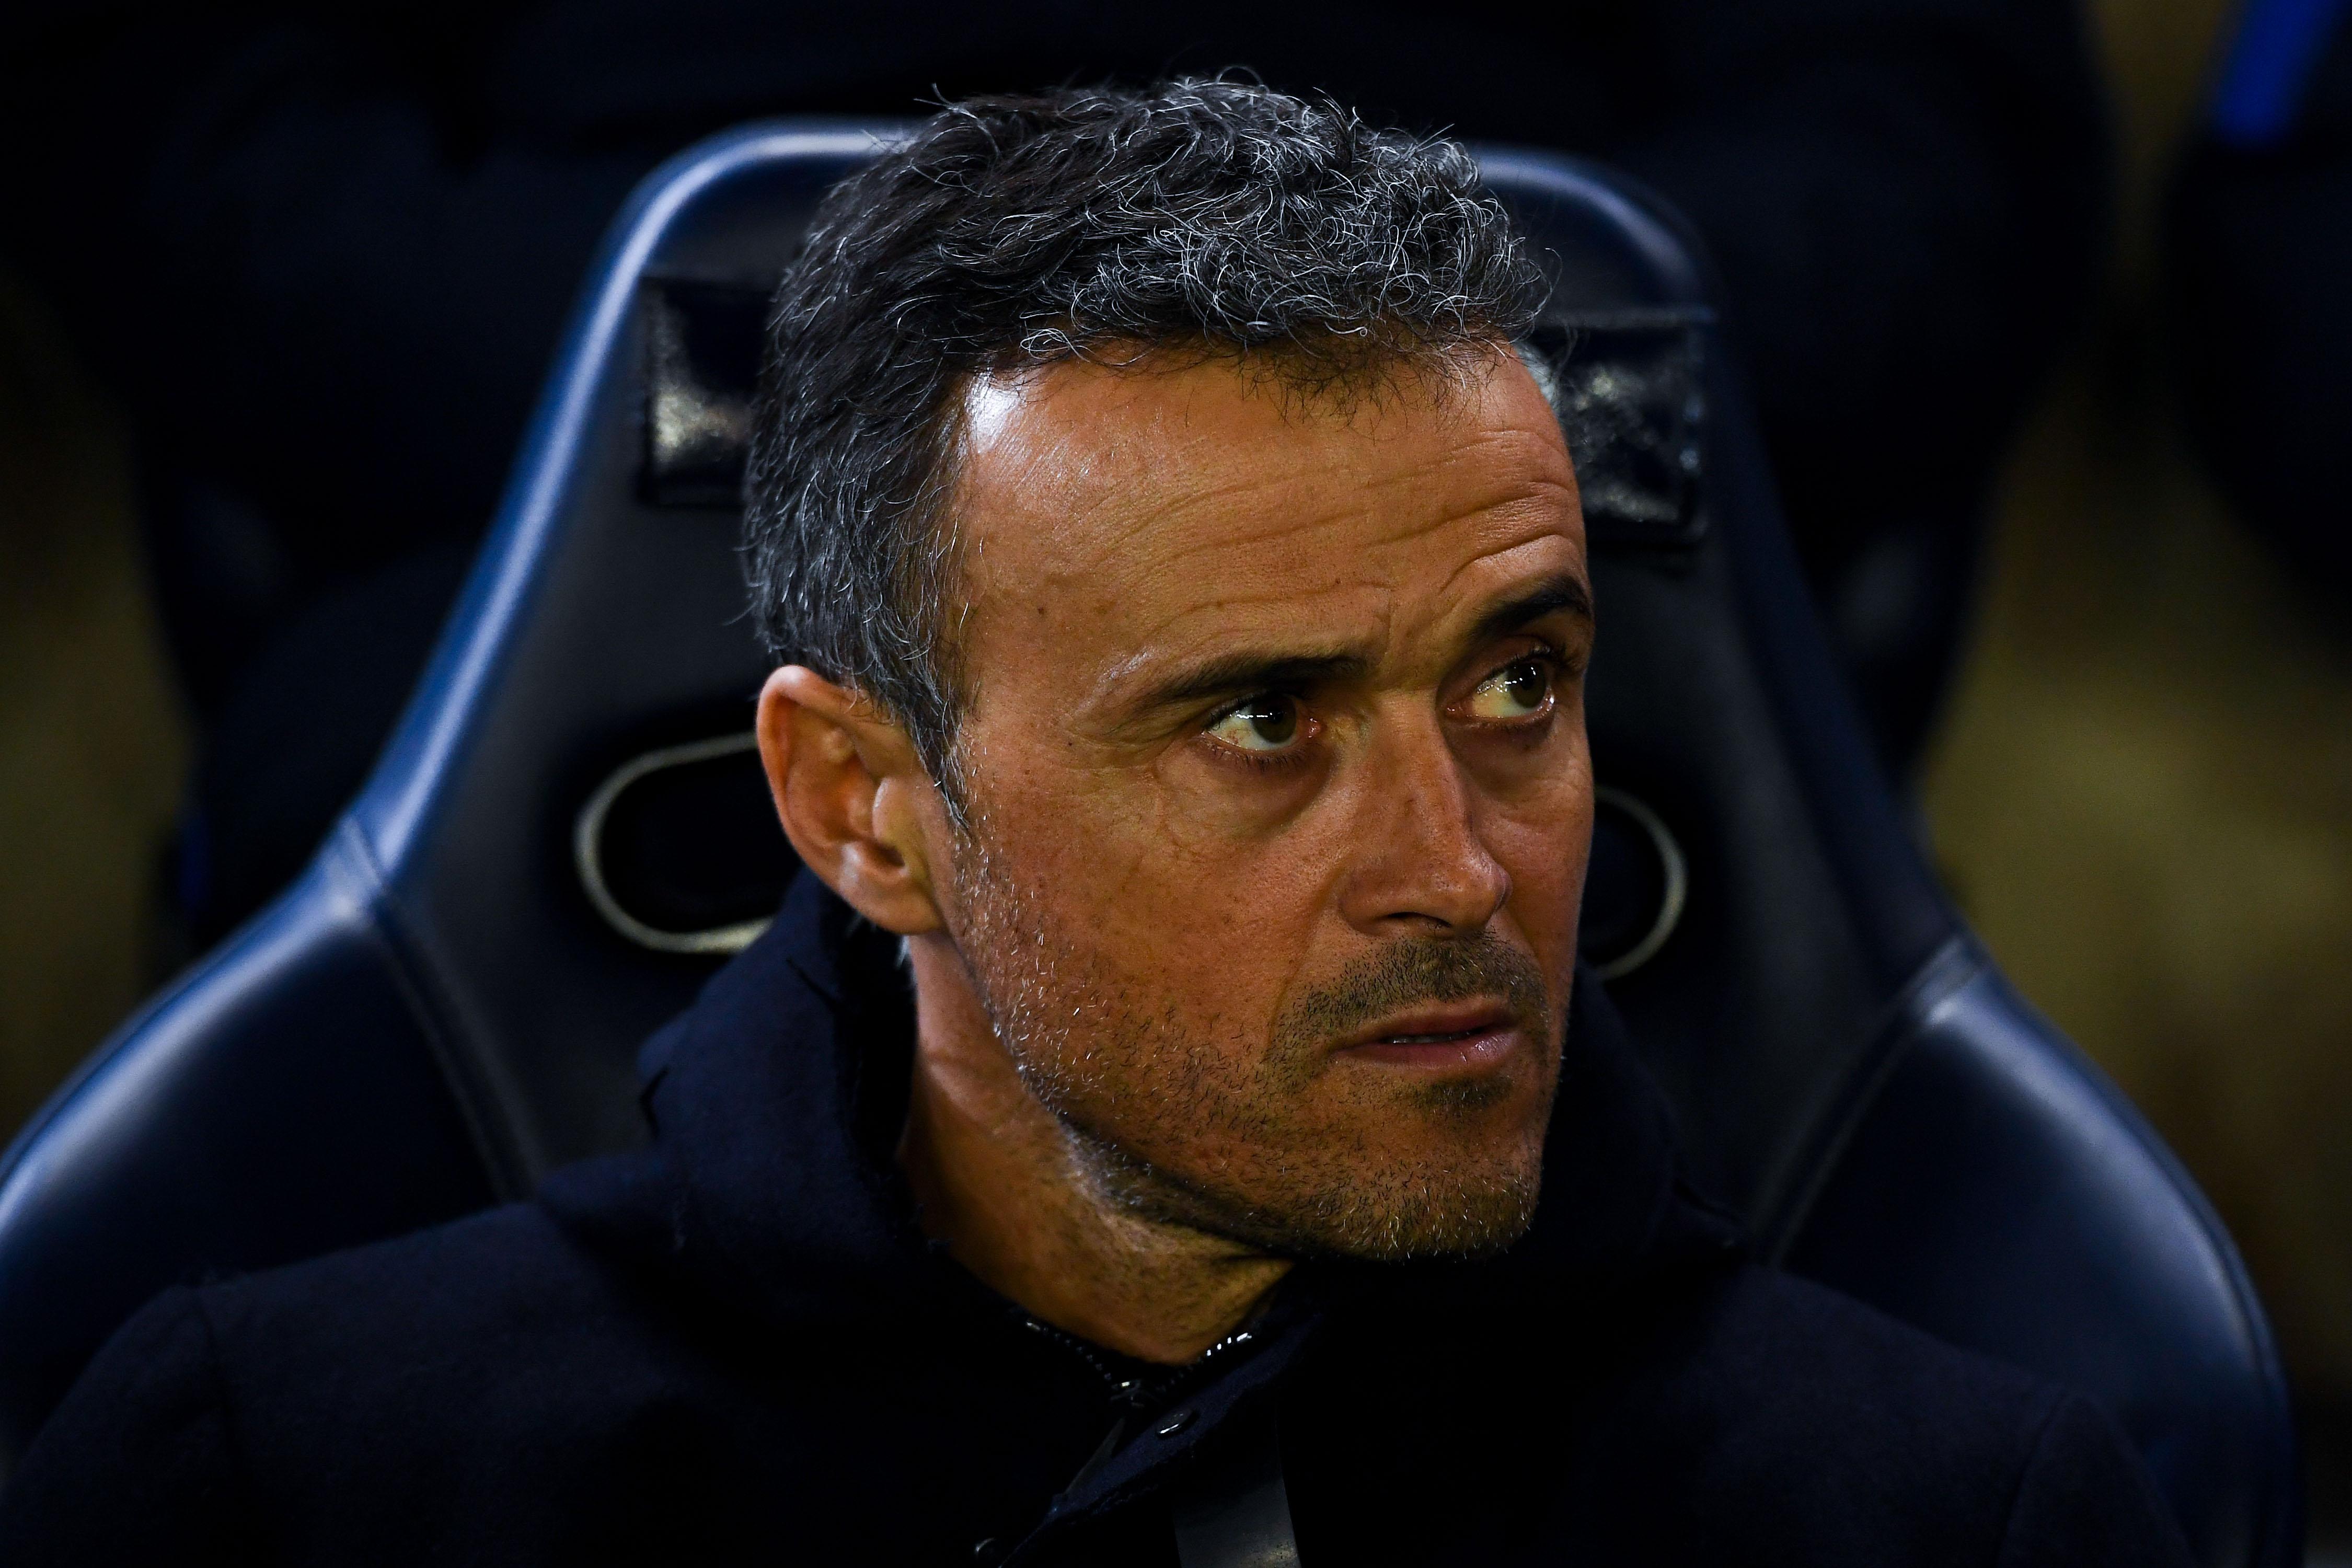 Has Luis Enrique lost Barcelona players' support?